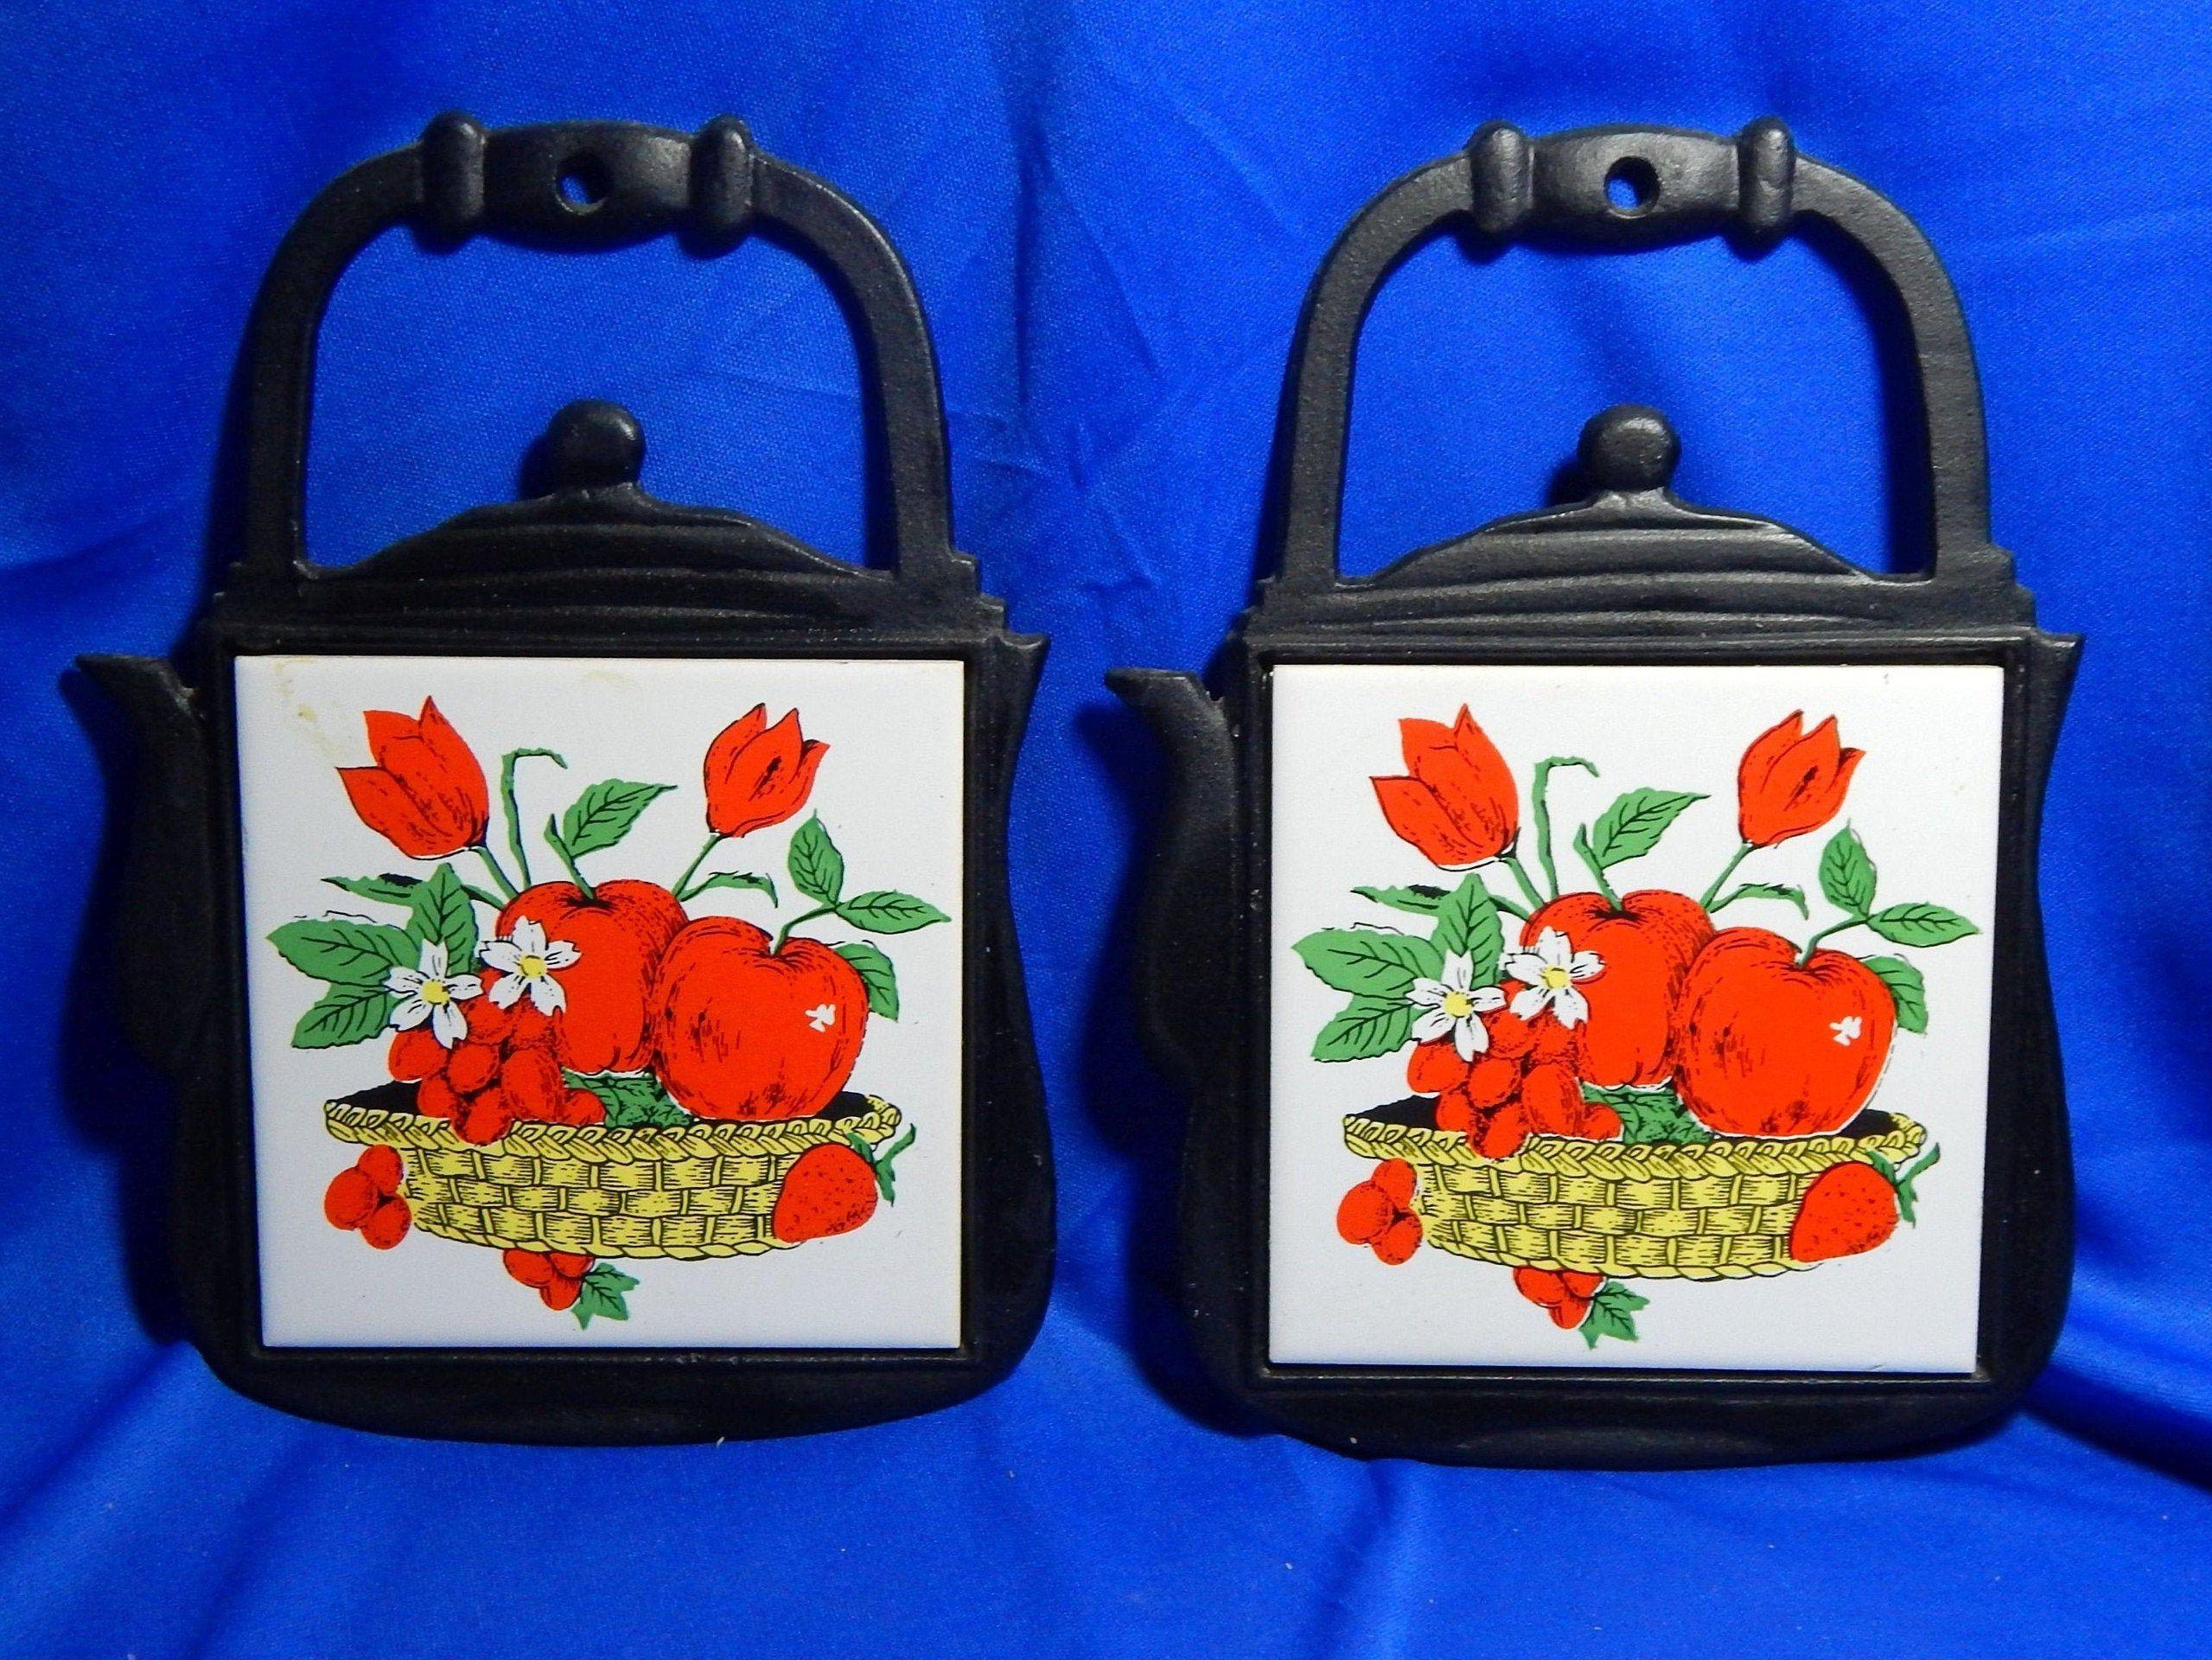 Cast Iron and Ceramic Kettle Trivet Red Tulips Design